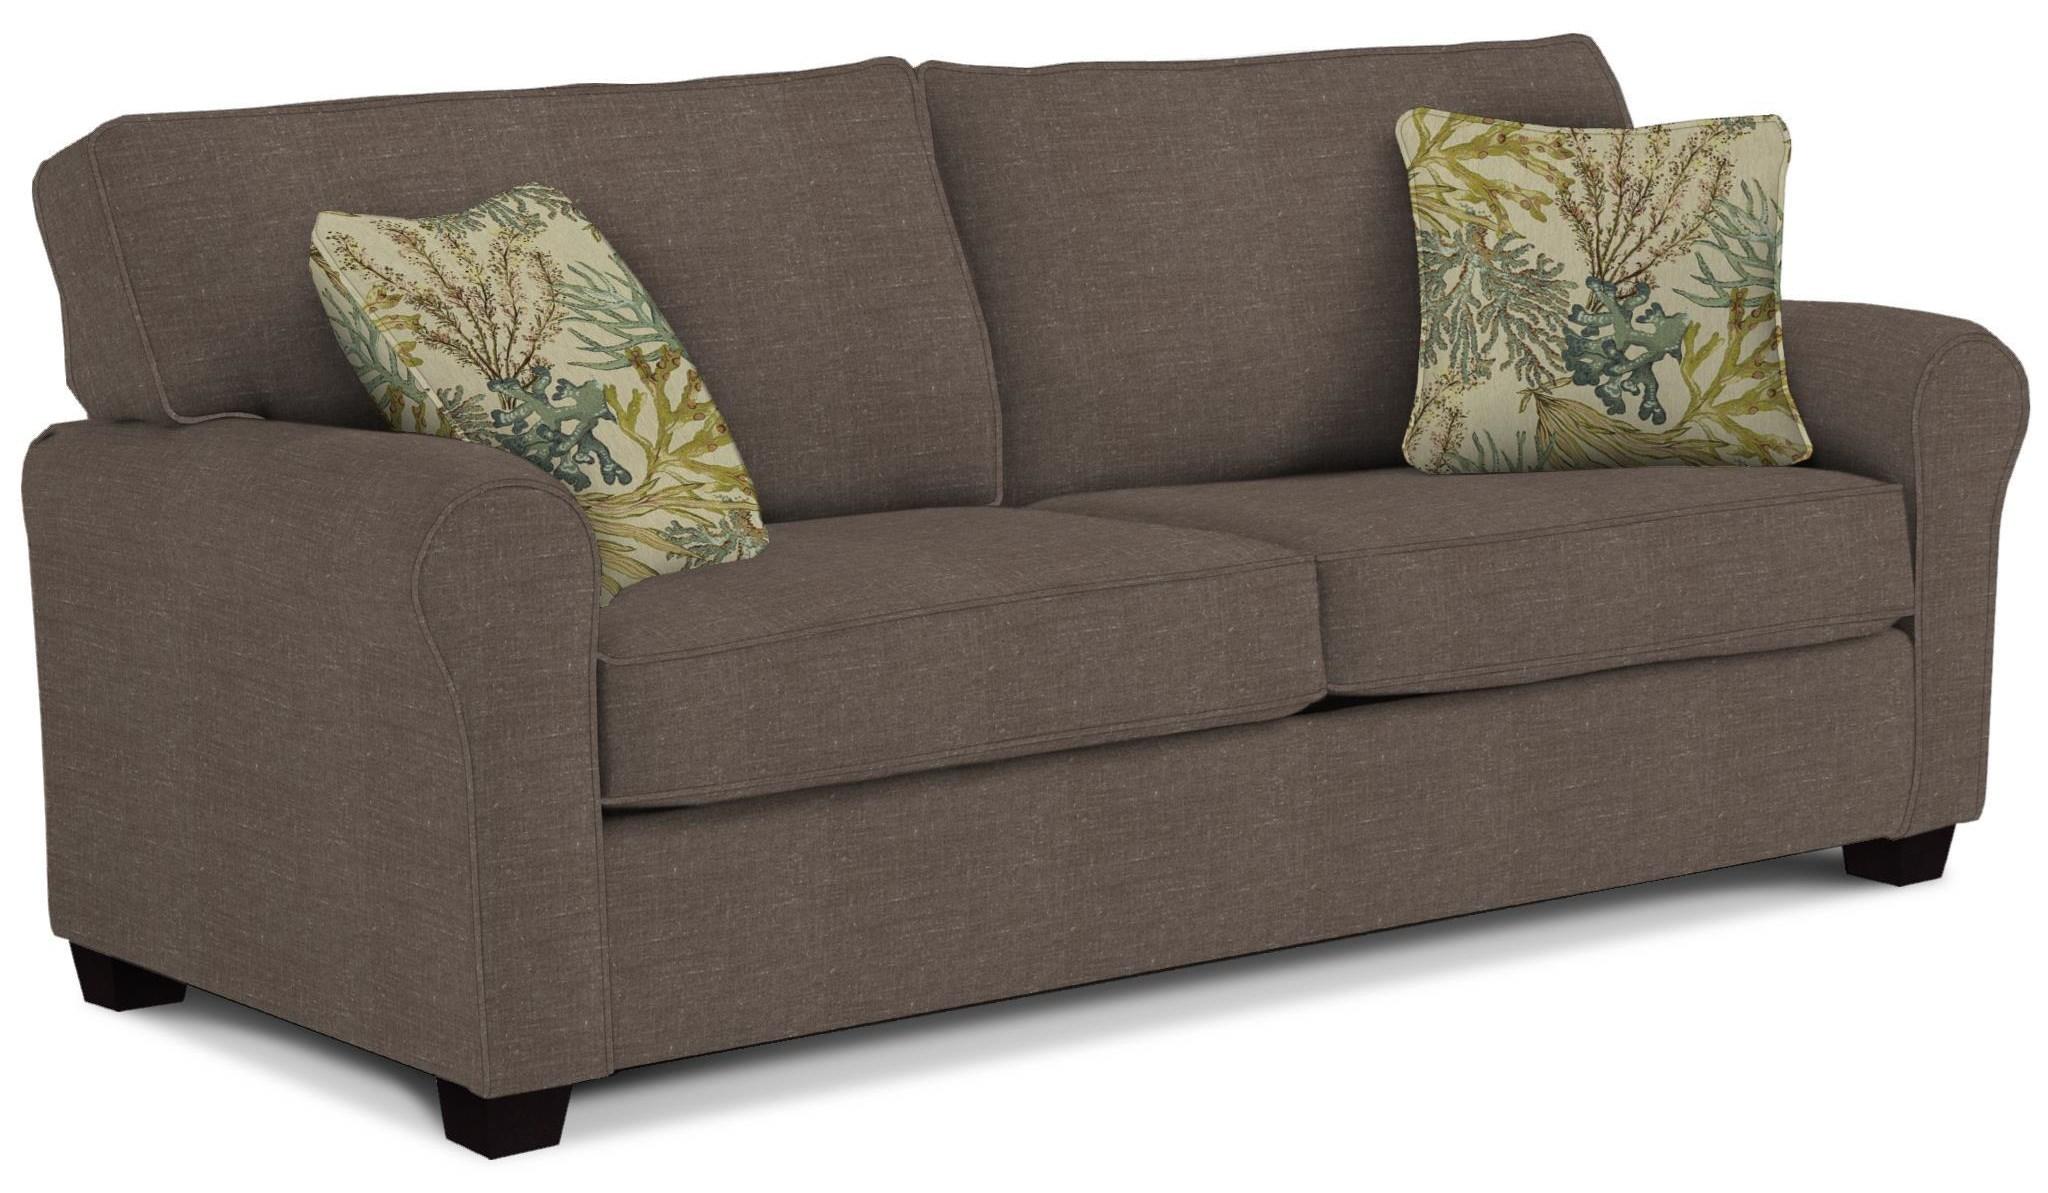 Best Home Furnishings Shannon Queen Sofa Sleeper With Air Dream Mattress